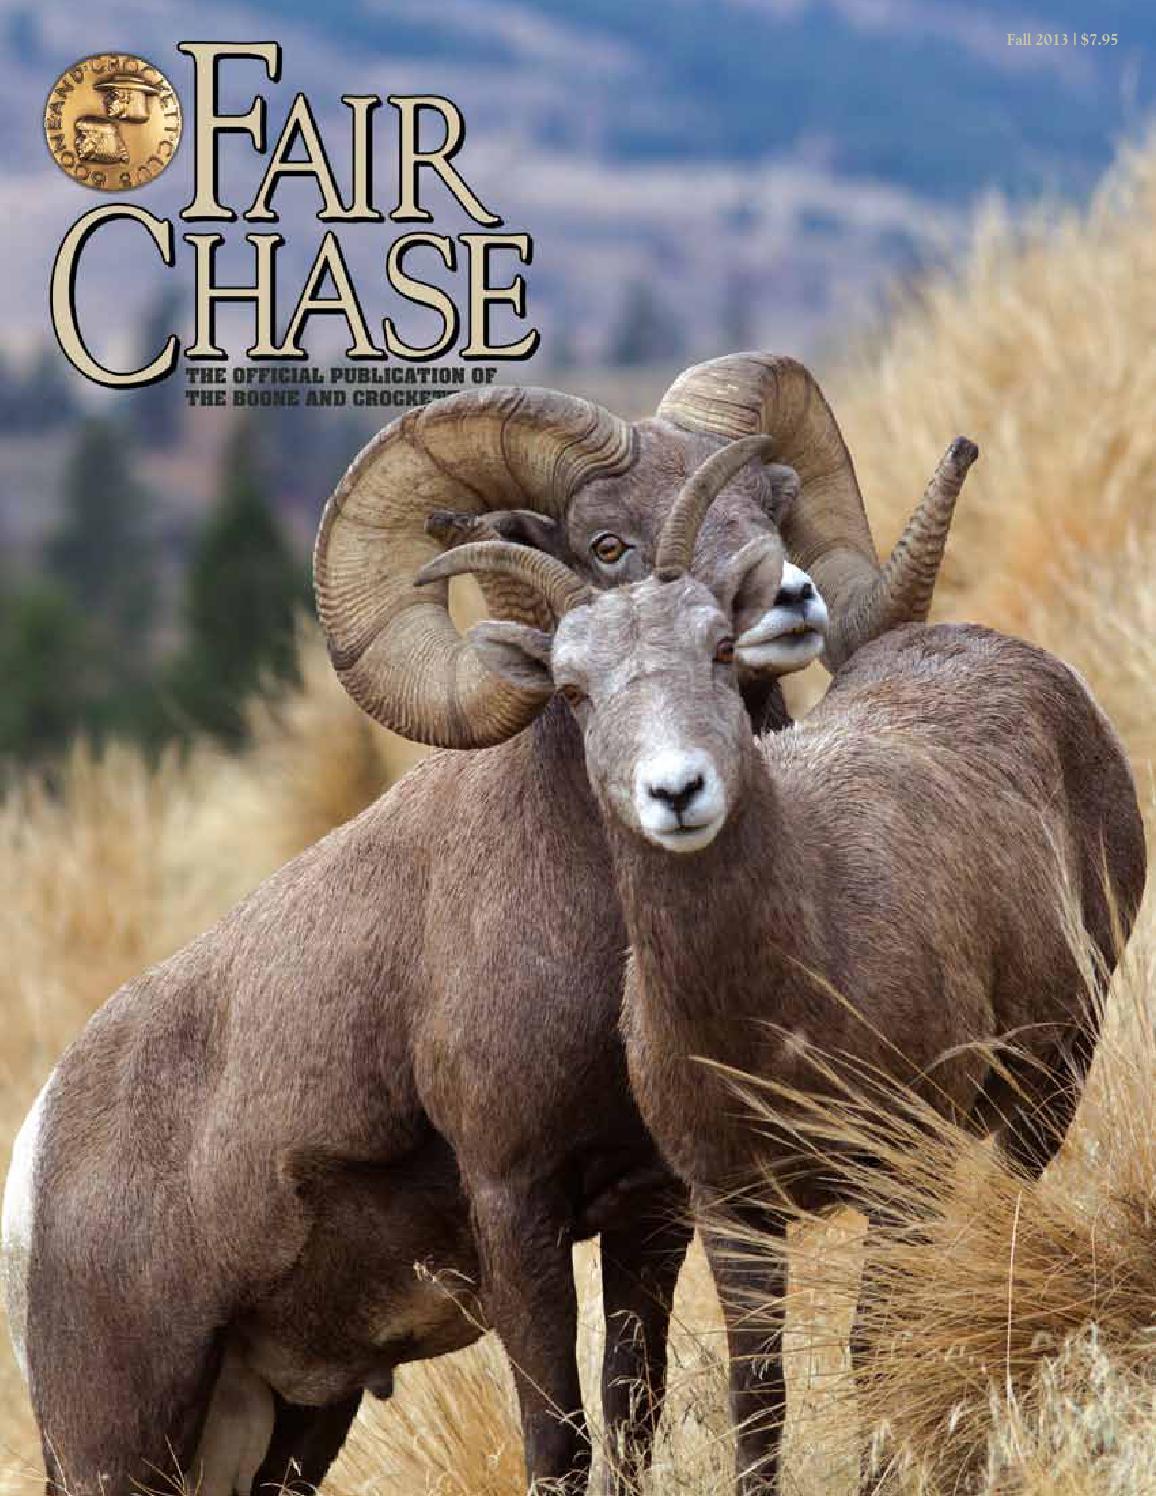 Fair Chase Fall 2013 by Boone and Crockett Club - issuu